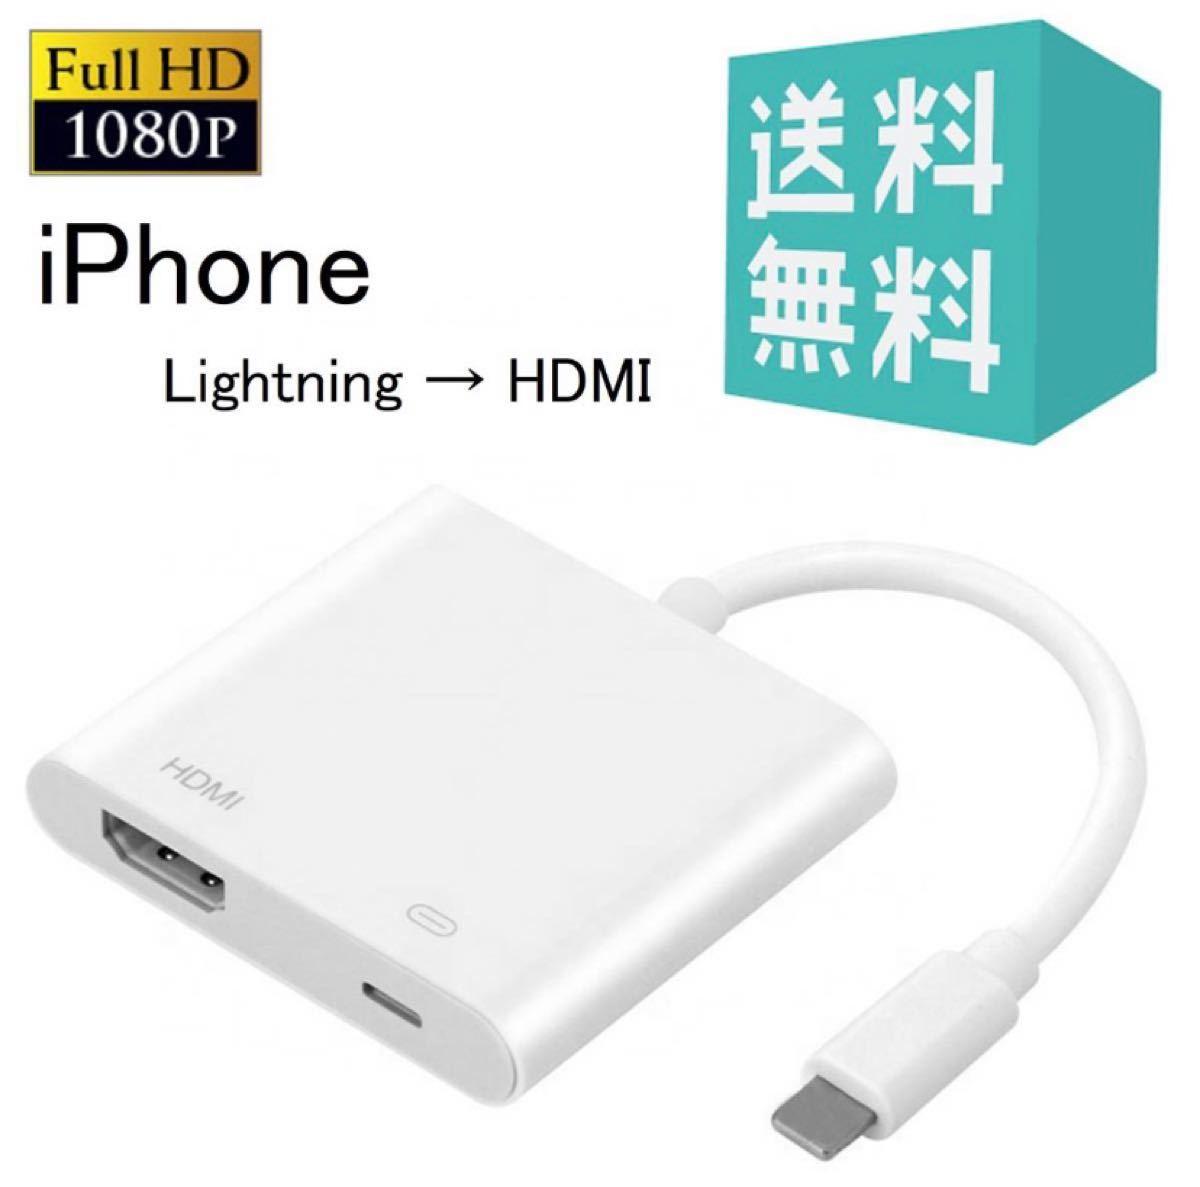 iPhone iPad HDMI変換 アップル Digital HDMI変換ケーブル HD画質 ライトニング 接続ケーブル